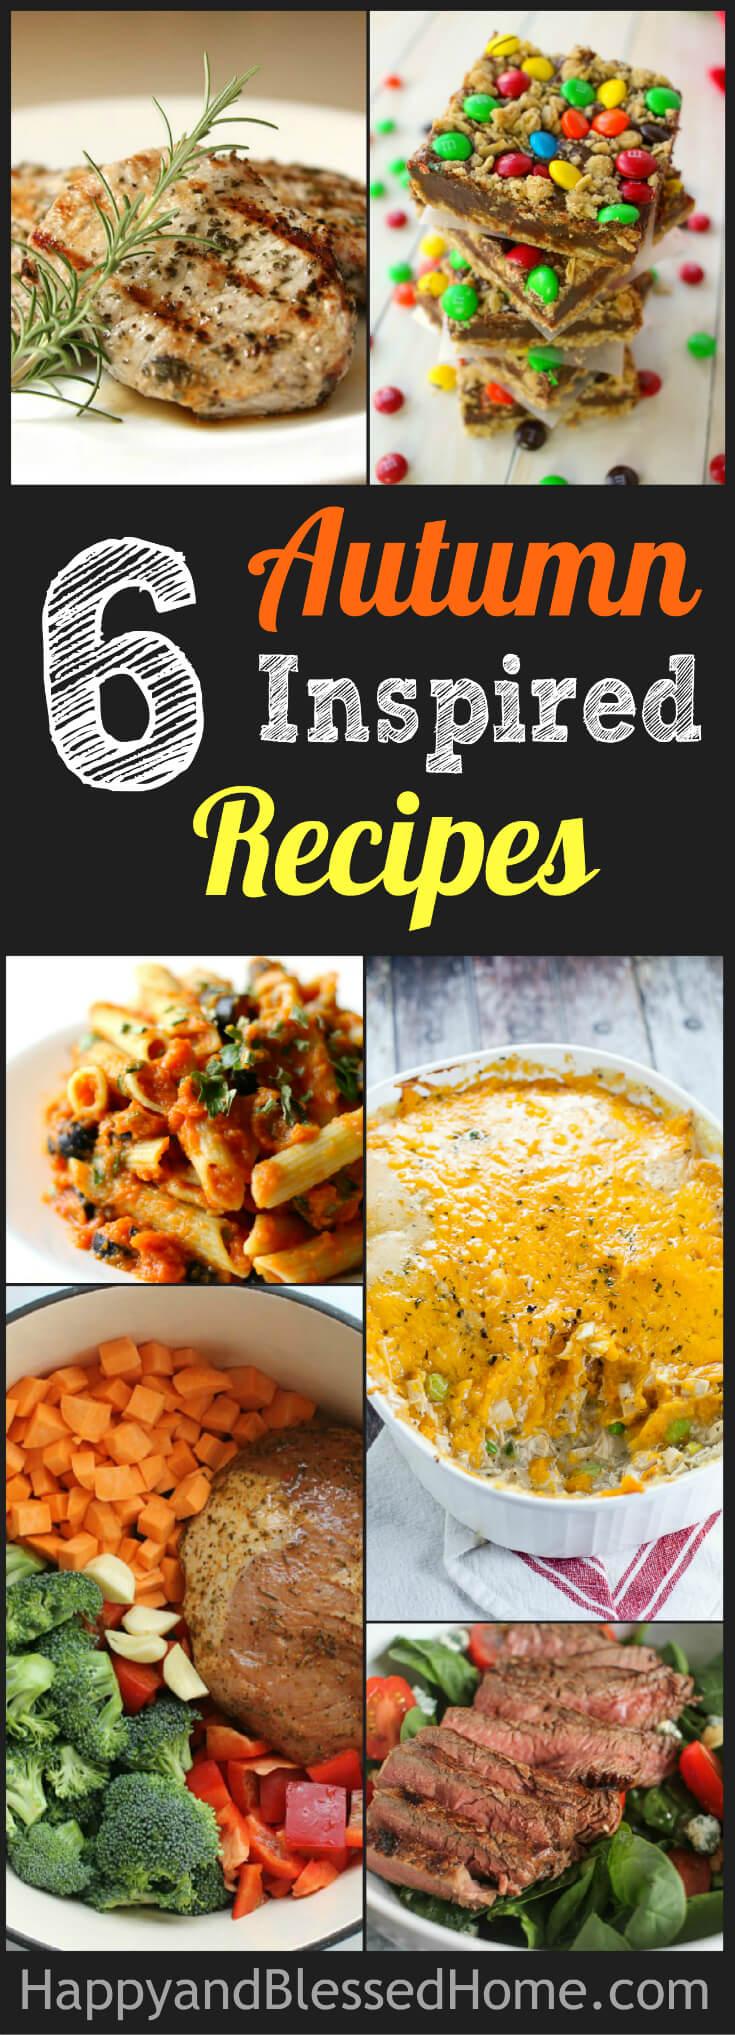 6 Autumn Inspired Recipes